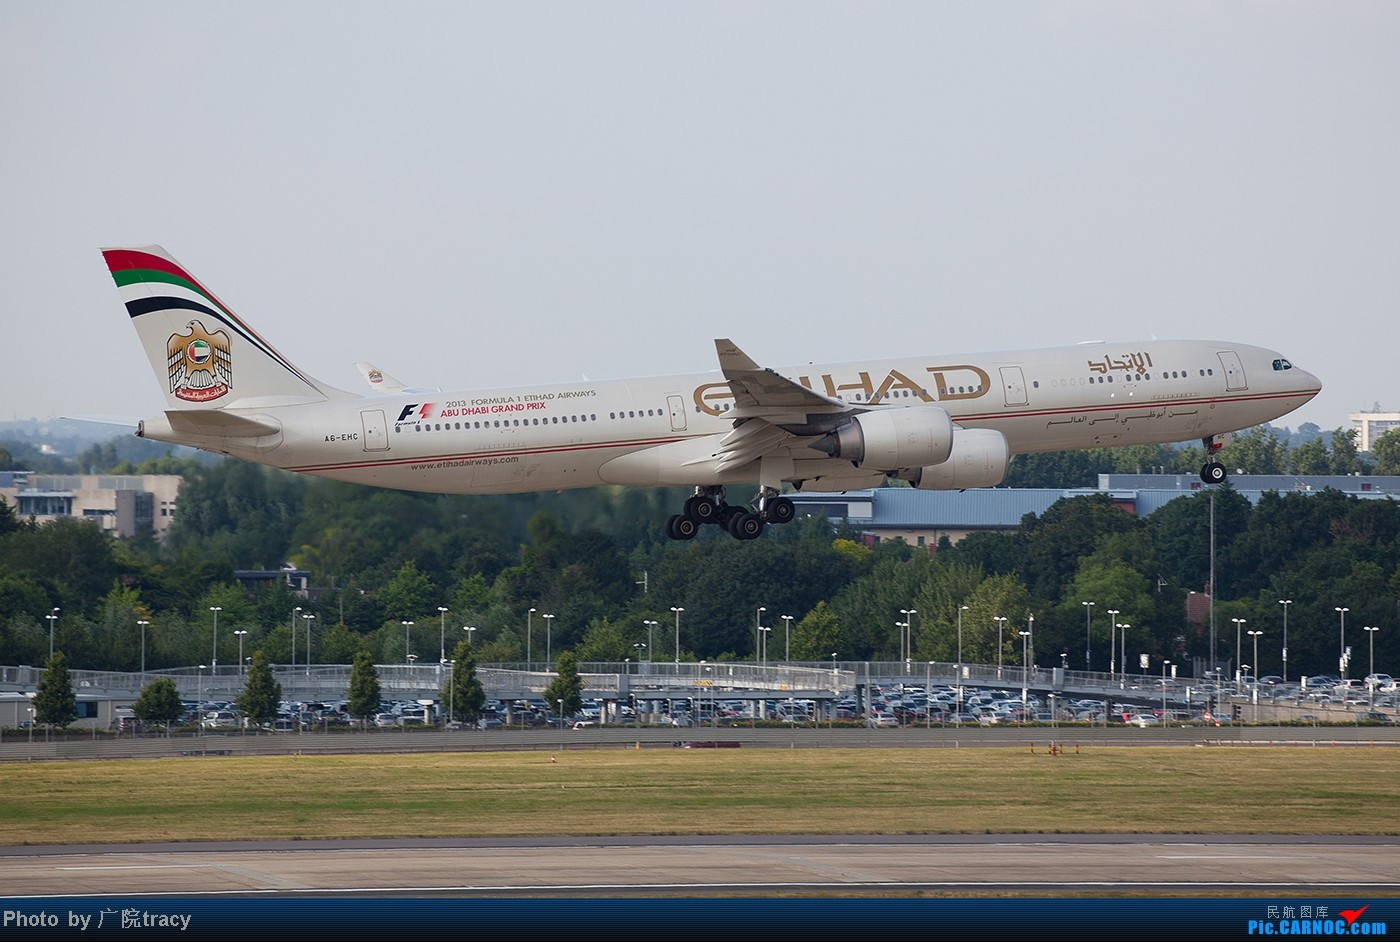 Re:[原创]★ ★ ★ ★ ★中东的航空公司在伦敦希斯罗国际机场  ★ ★ ★ ★ ★ AIRBUS A340-500 A6-EHC 英国伦敦希思罗机场